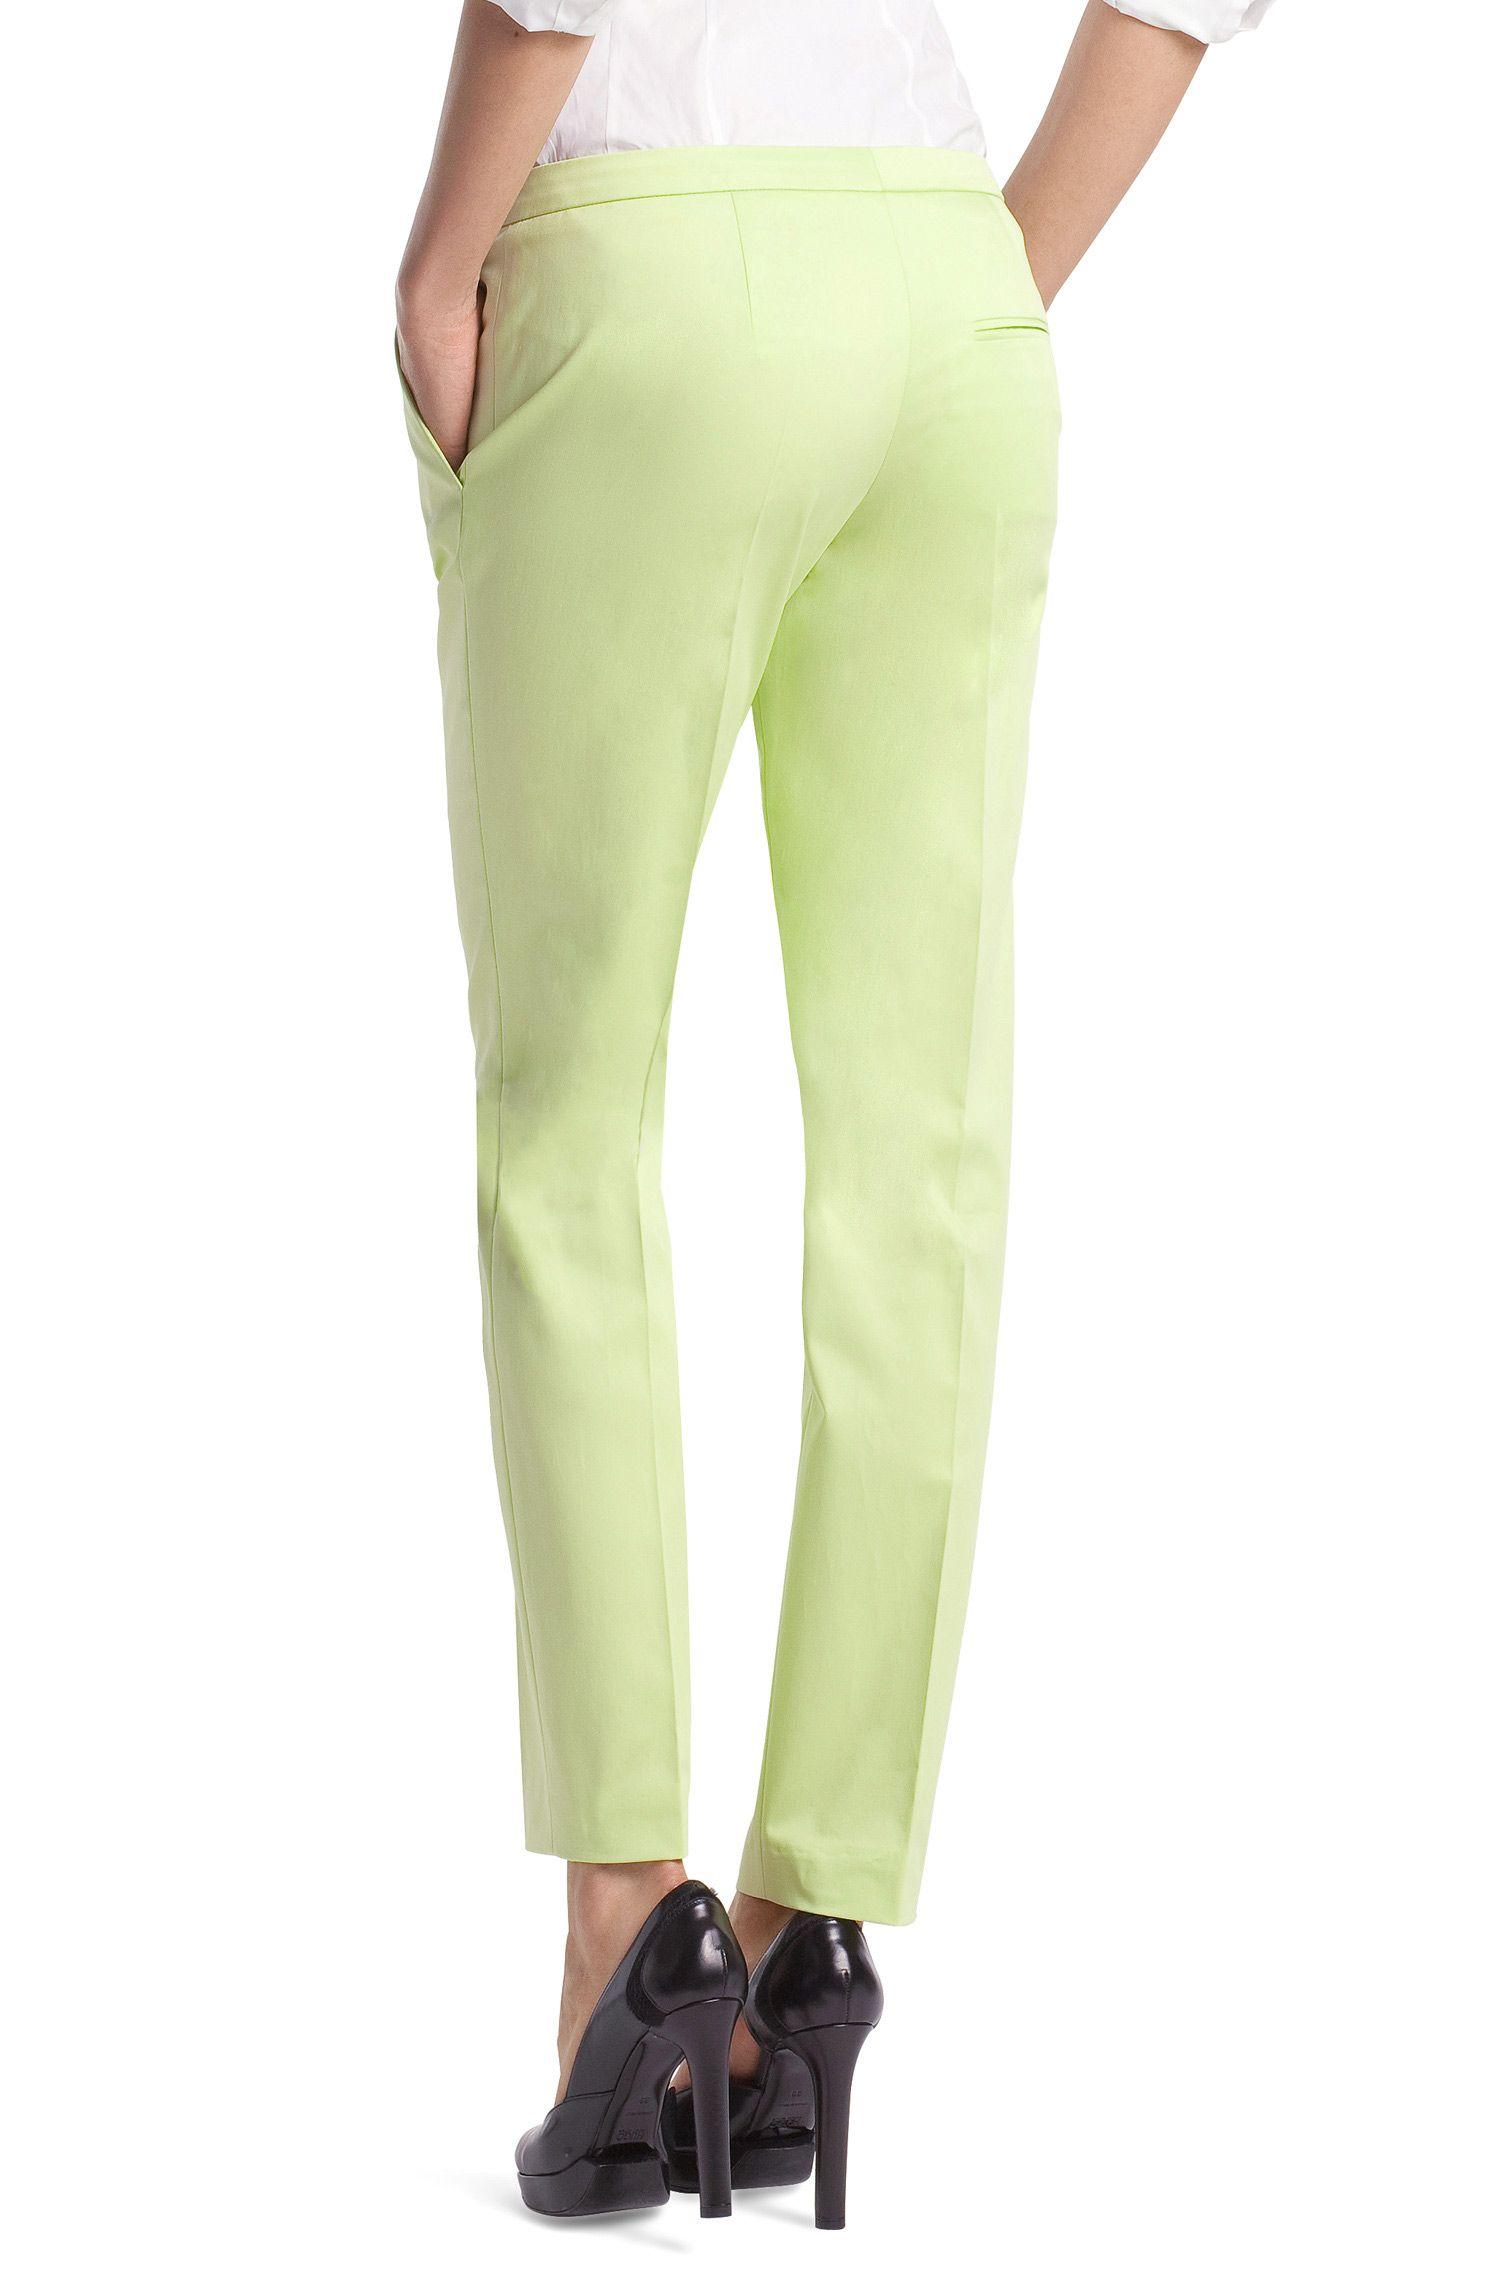 Fashion-Hose ´Harile` aus Baumwoll-Elasthan Mix